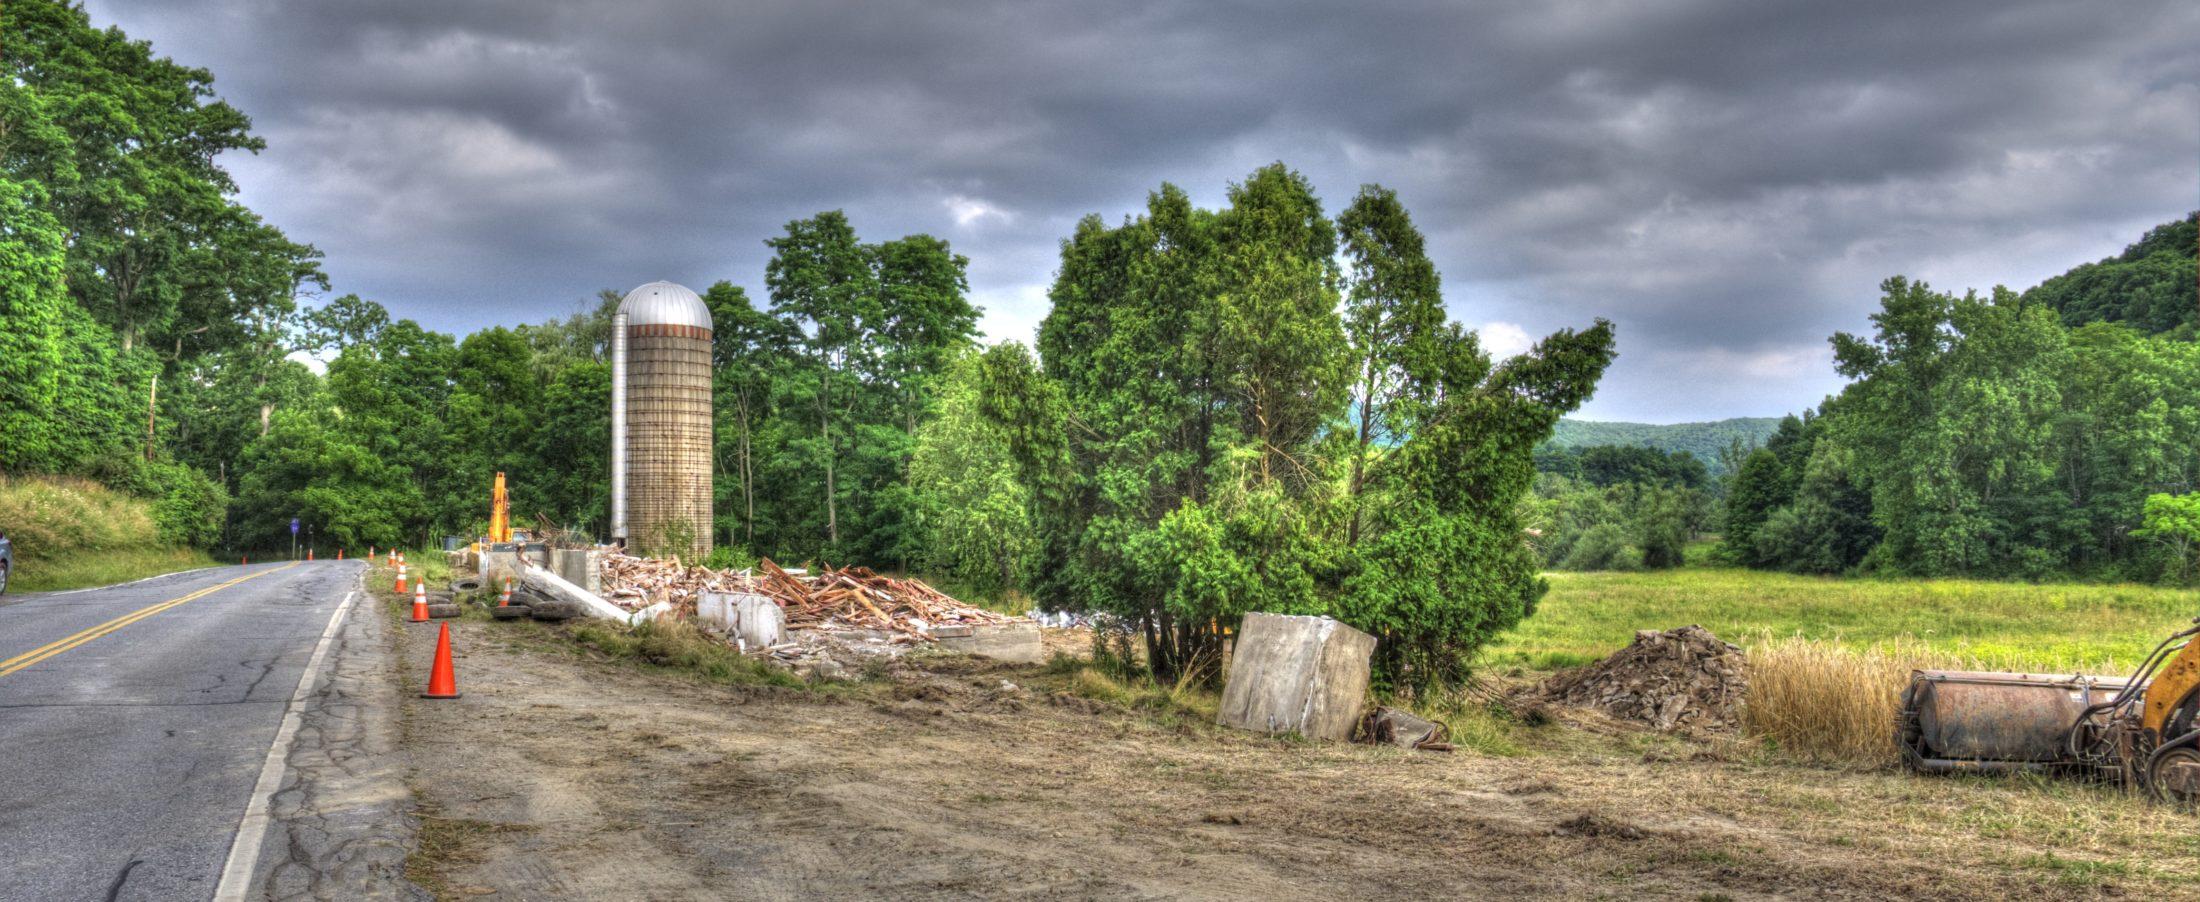 Pine Plains Views in Video